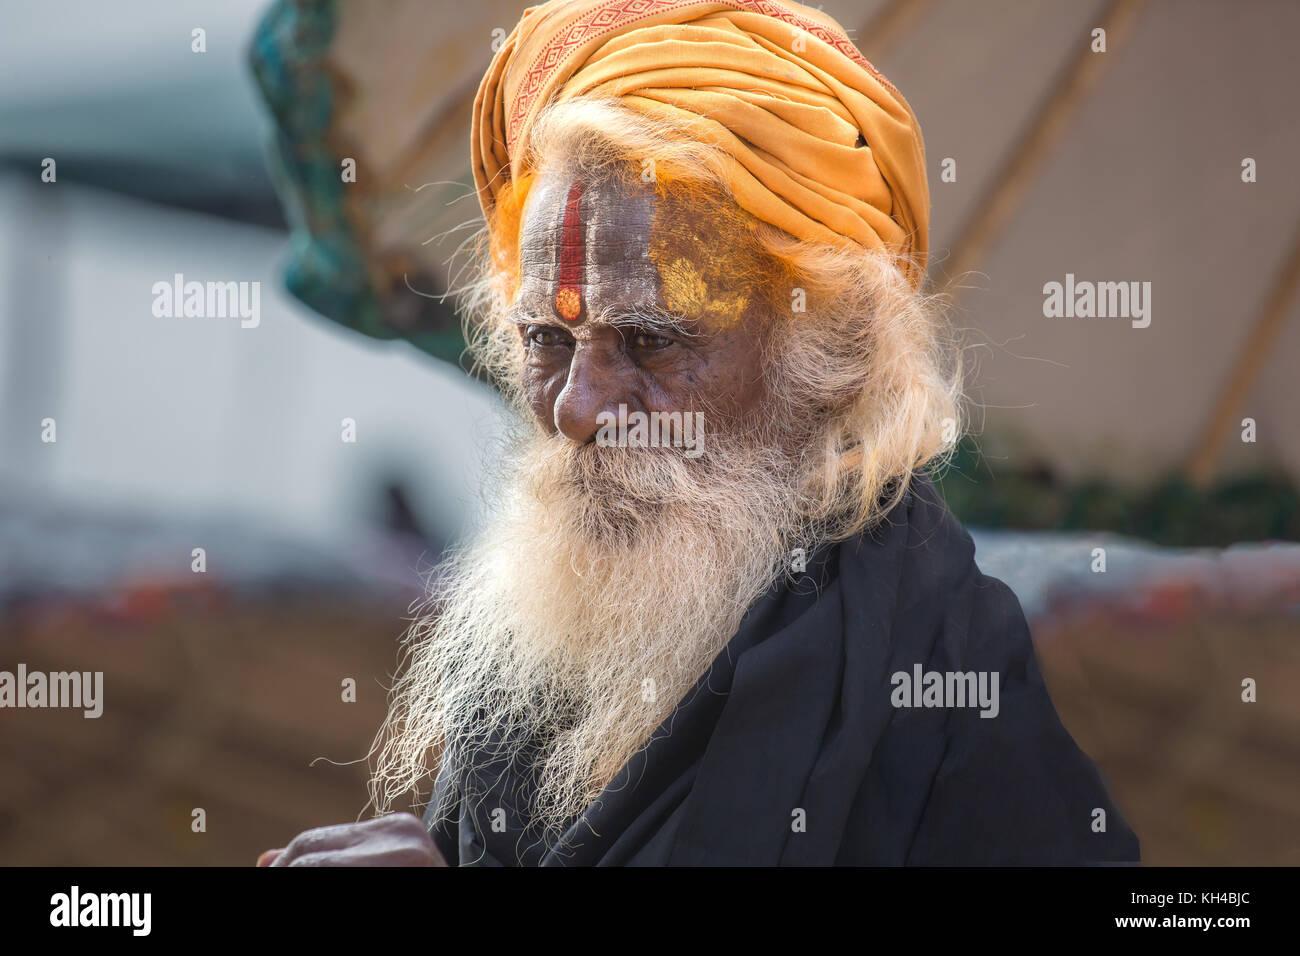 Portrait of Hindu sadhu, holy man on the Ganges river ghat at Varanasi India - Stock Image